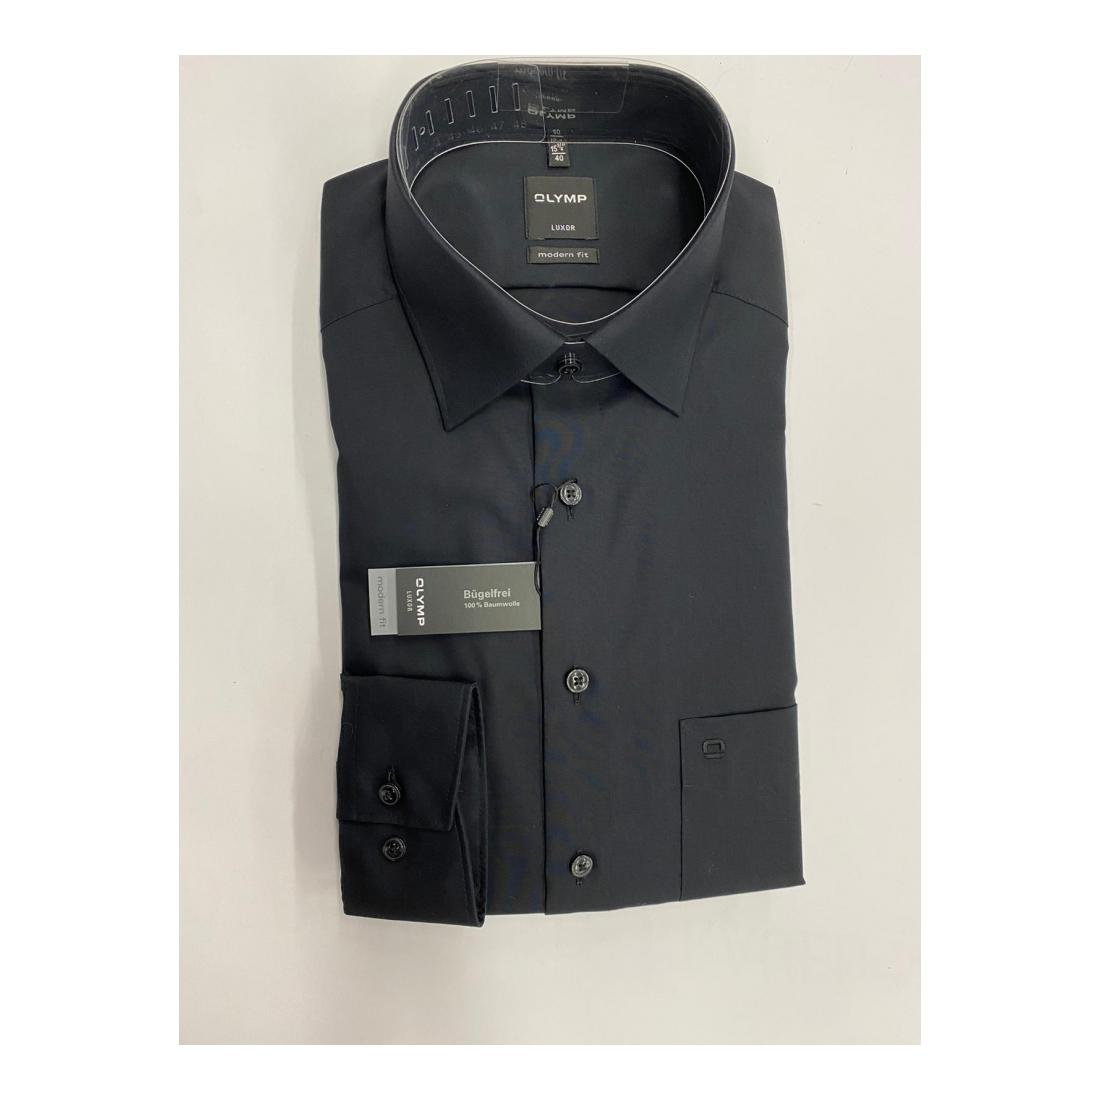 Olymp Business Hemden Herren 0300/64 Hemden